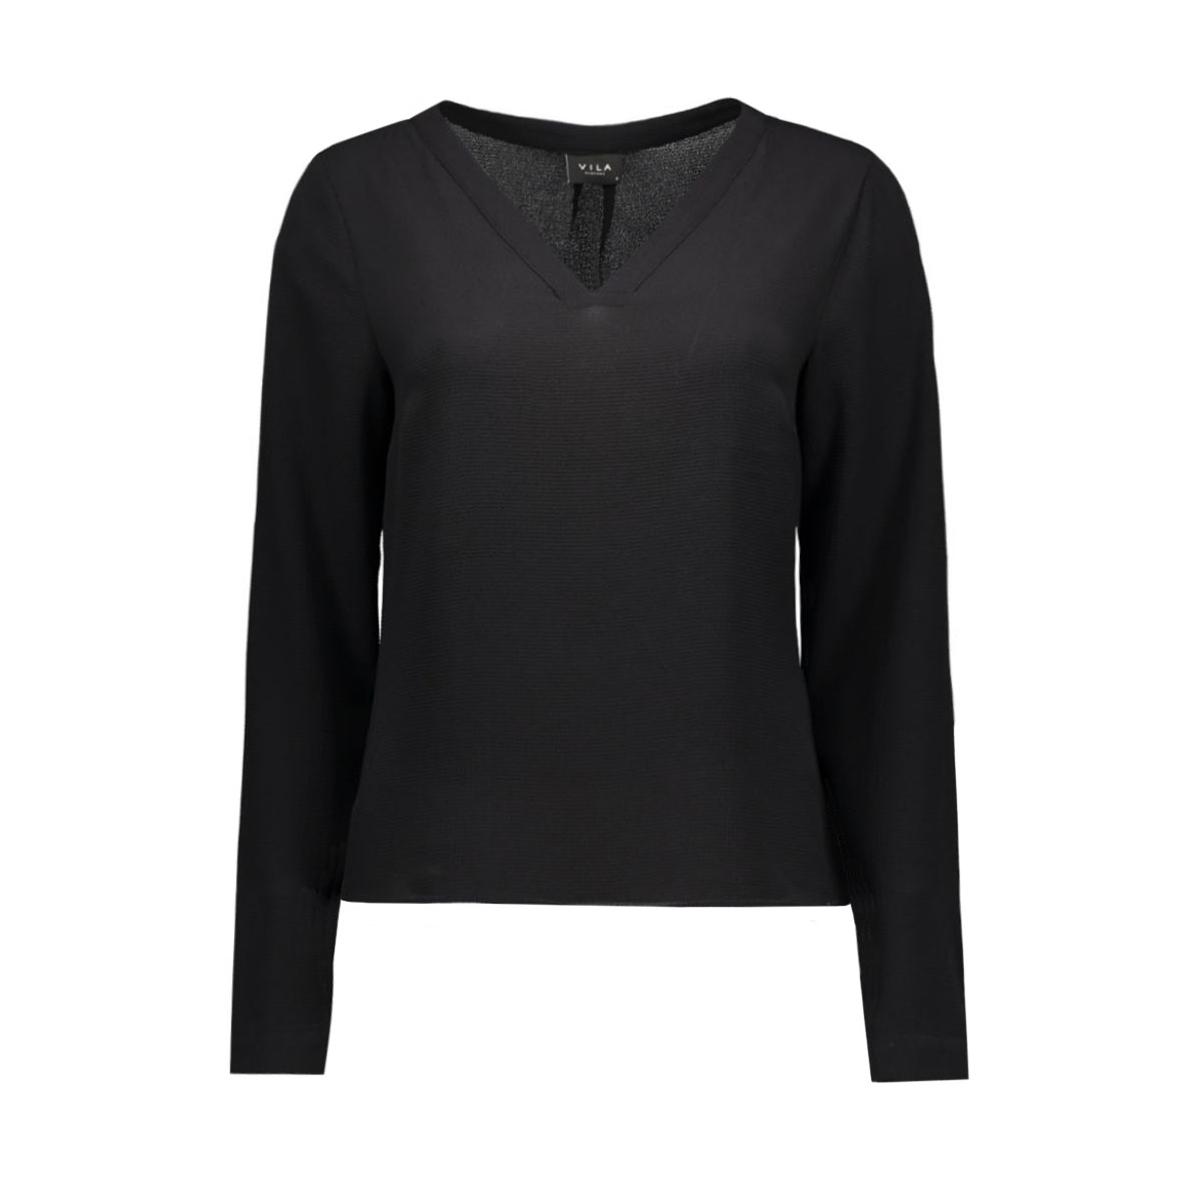 viremember l/s top-noos 14036047 vila blouse black